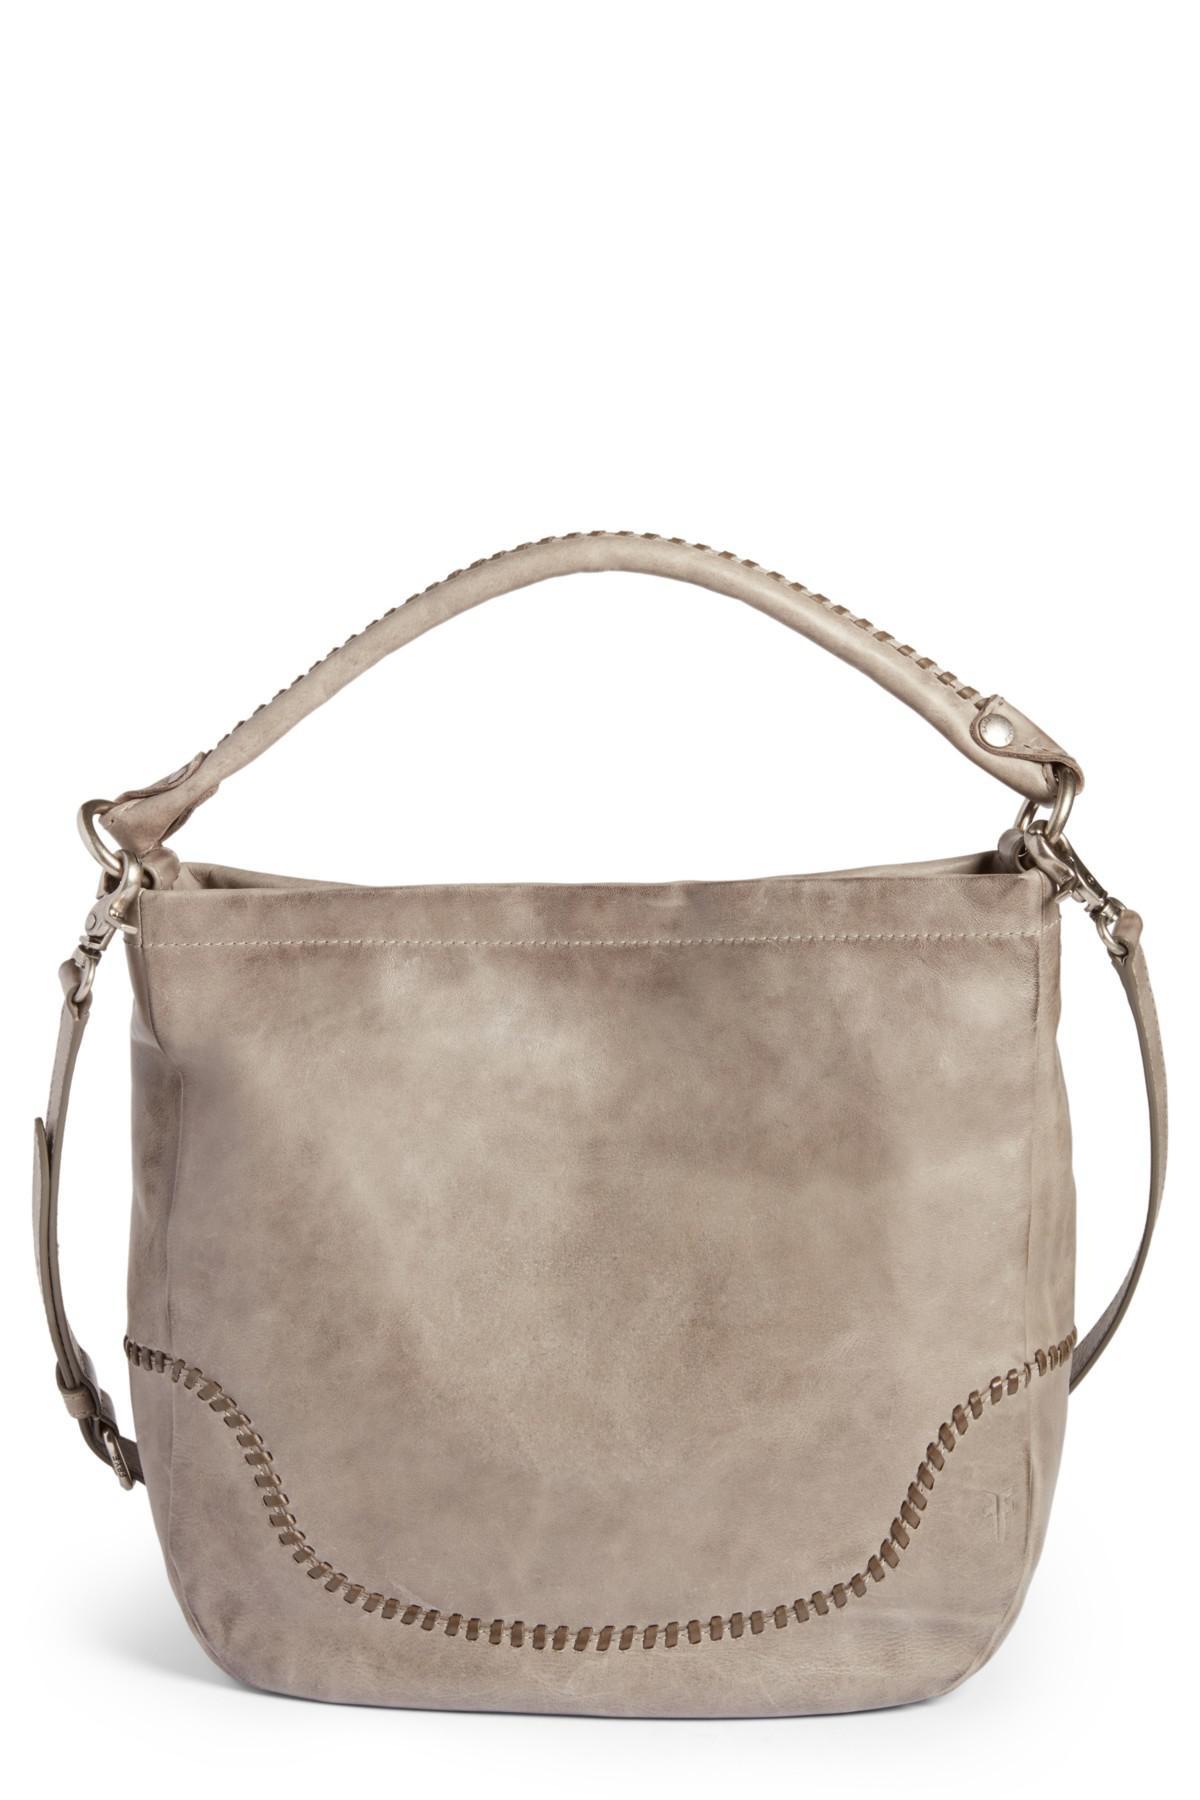 2560b01bf Frye Melissa Whipstitch Leather Hobo Bag - Lyst